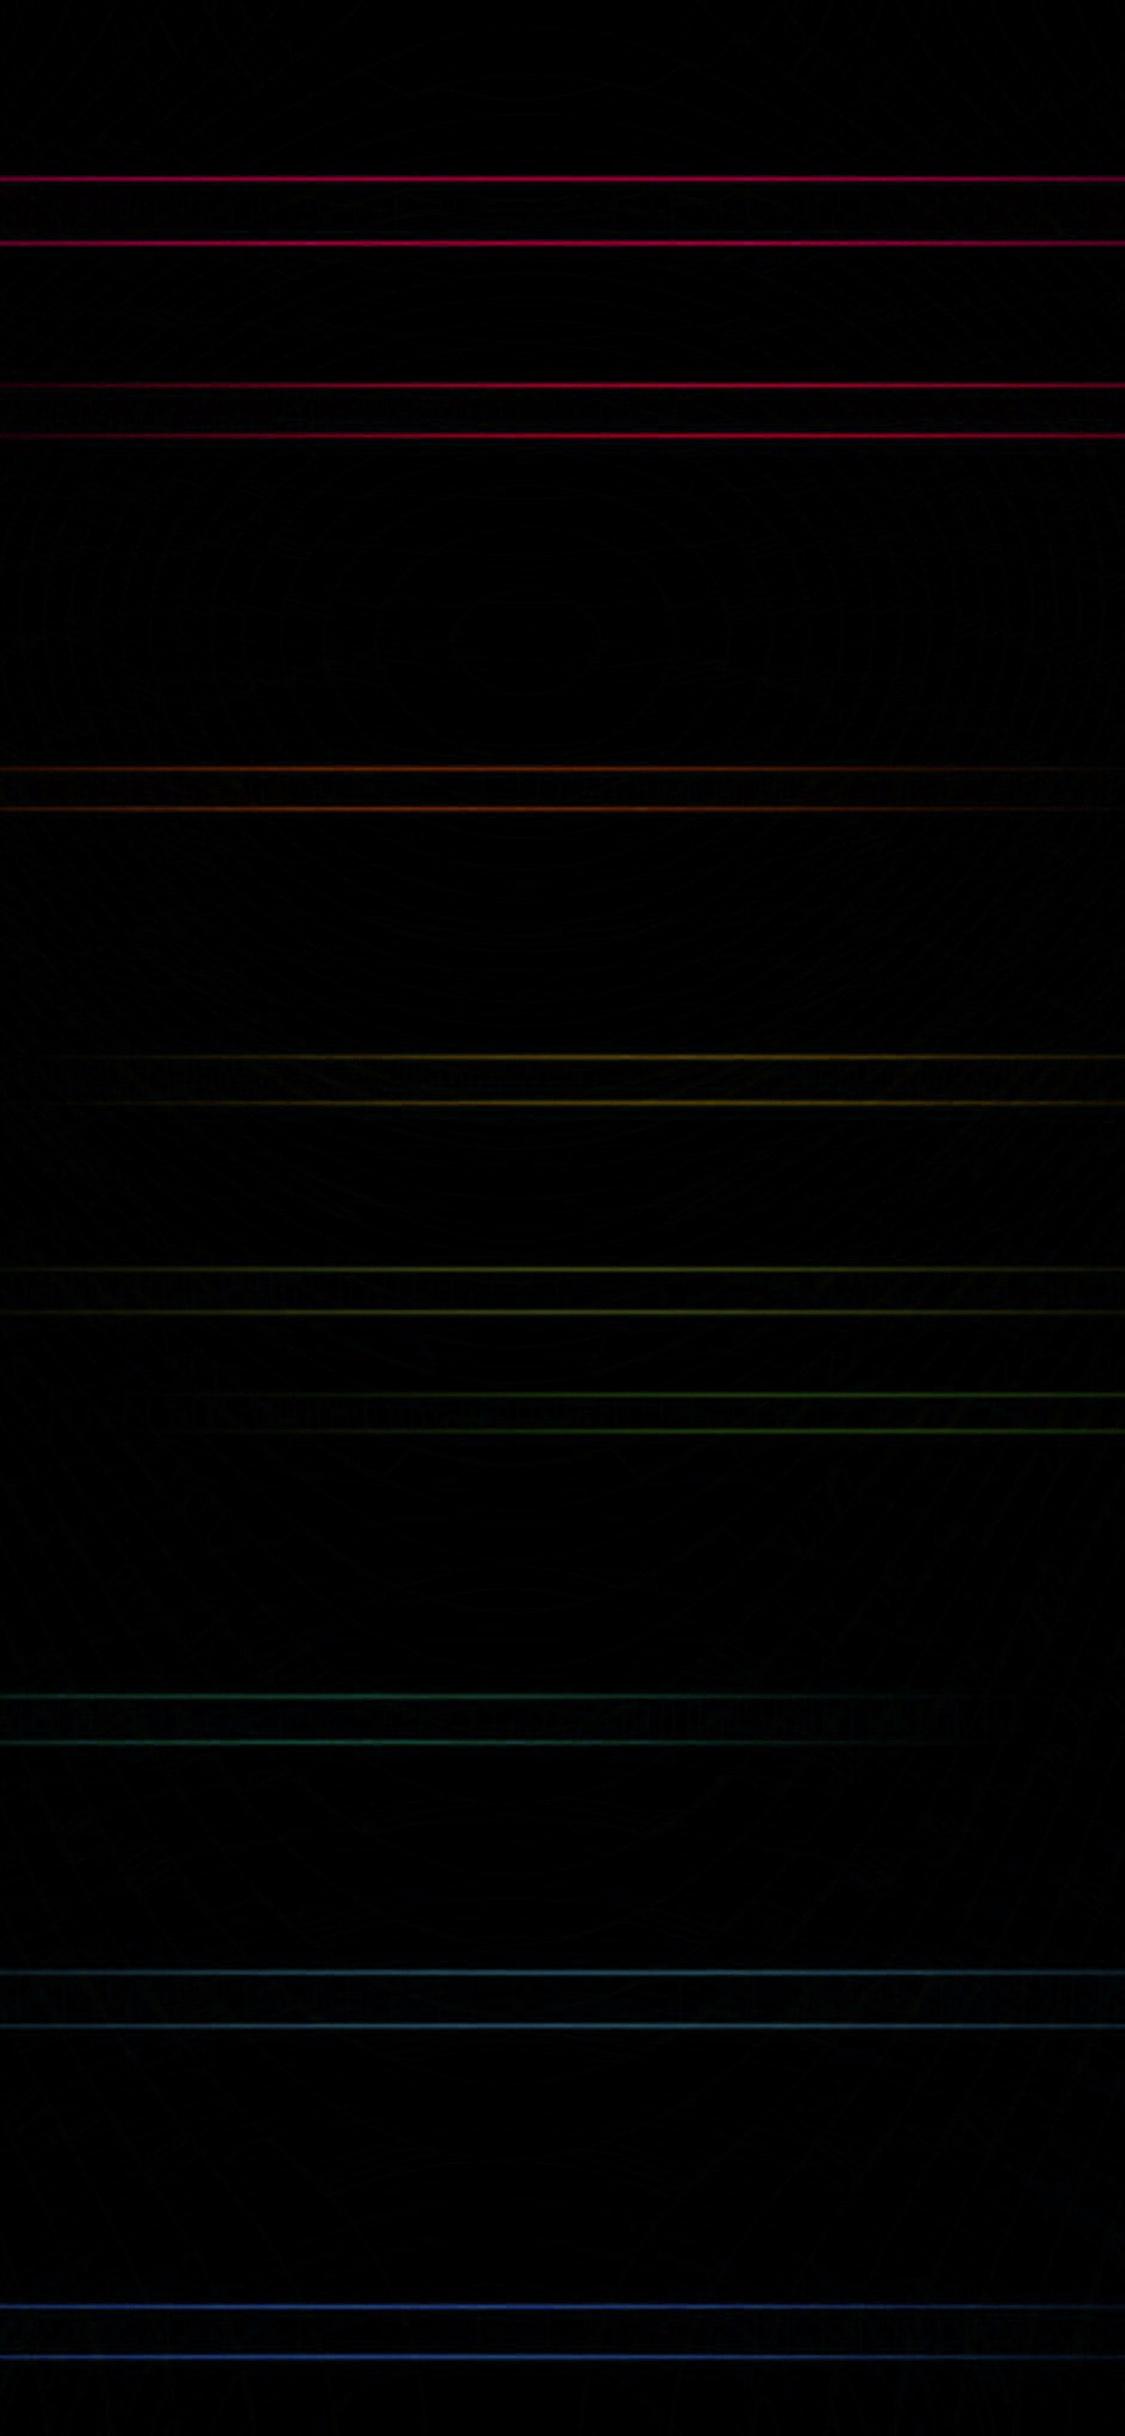 iPhonexpapers.com-Apple-iPhone-wallpaper-vu15-line-dark-color-pattern-rainbow